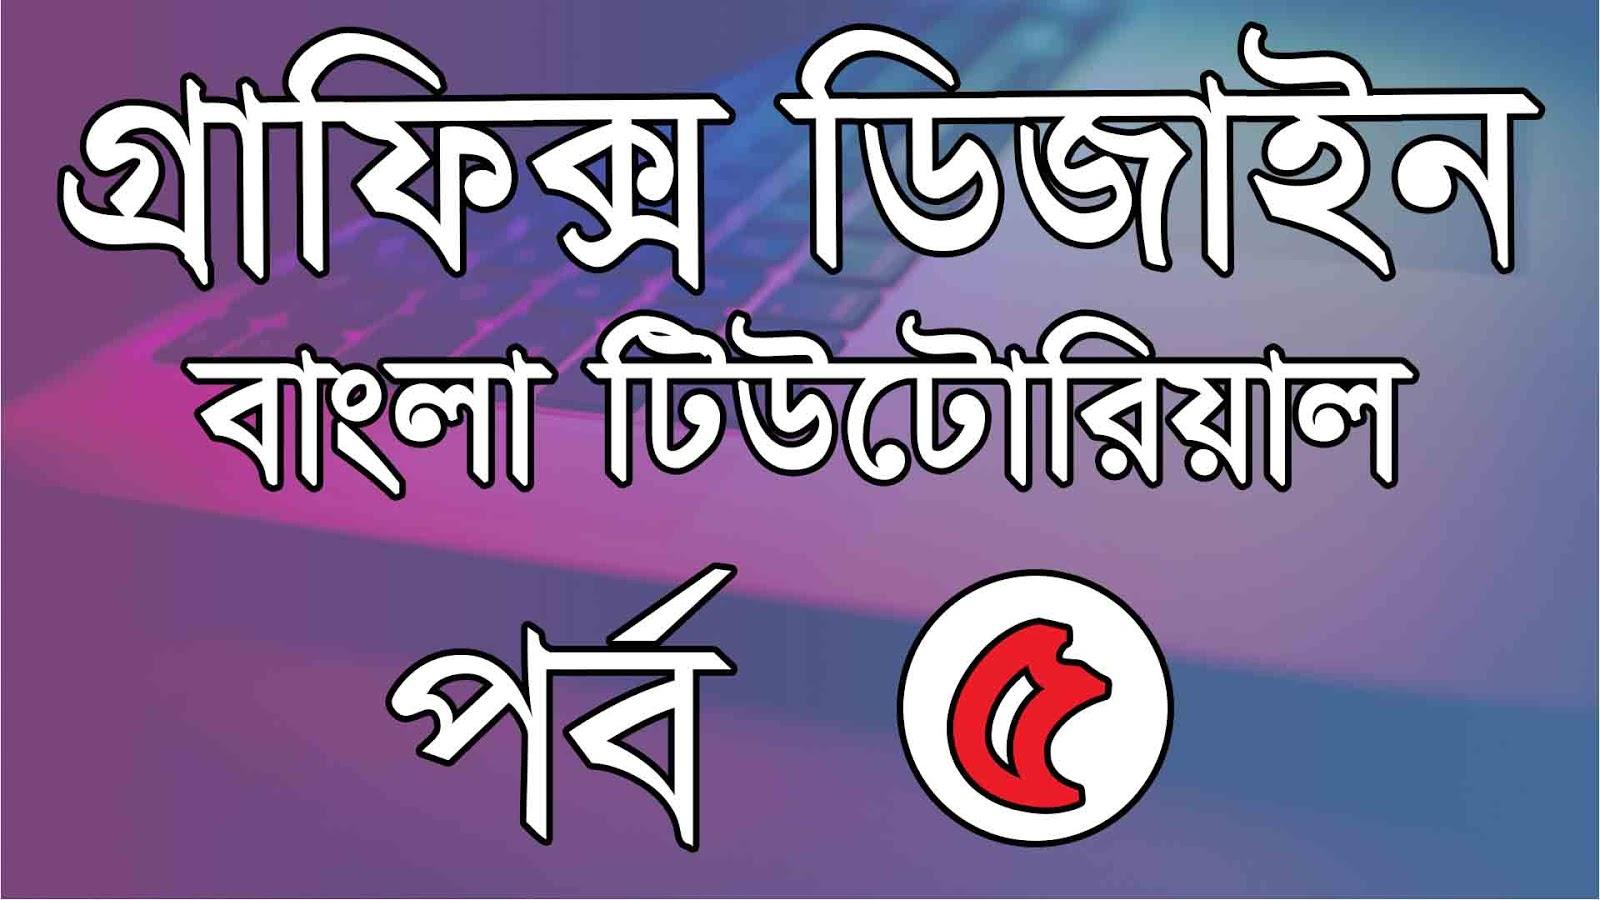 Photoshop cc bangla tutorial part 5 | graphics design bangla